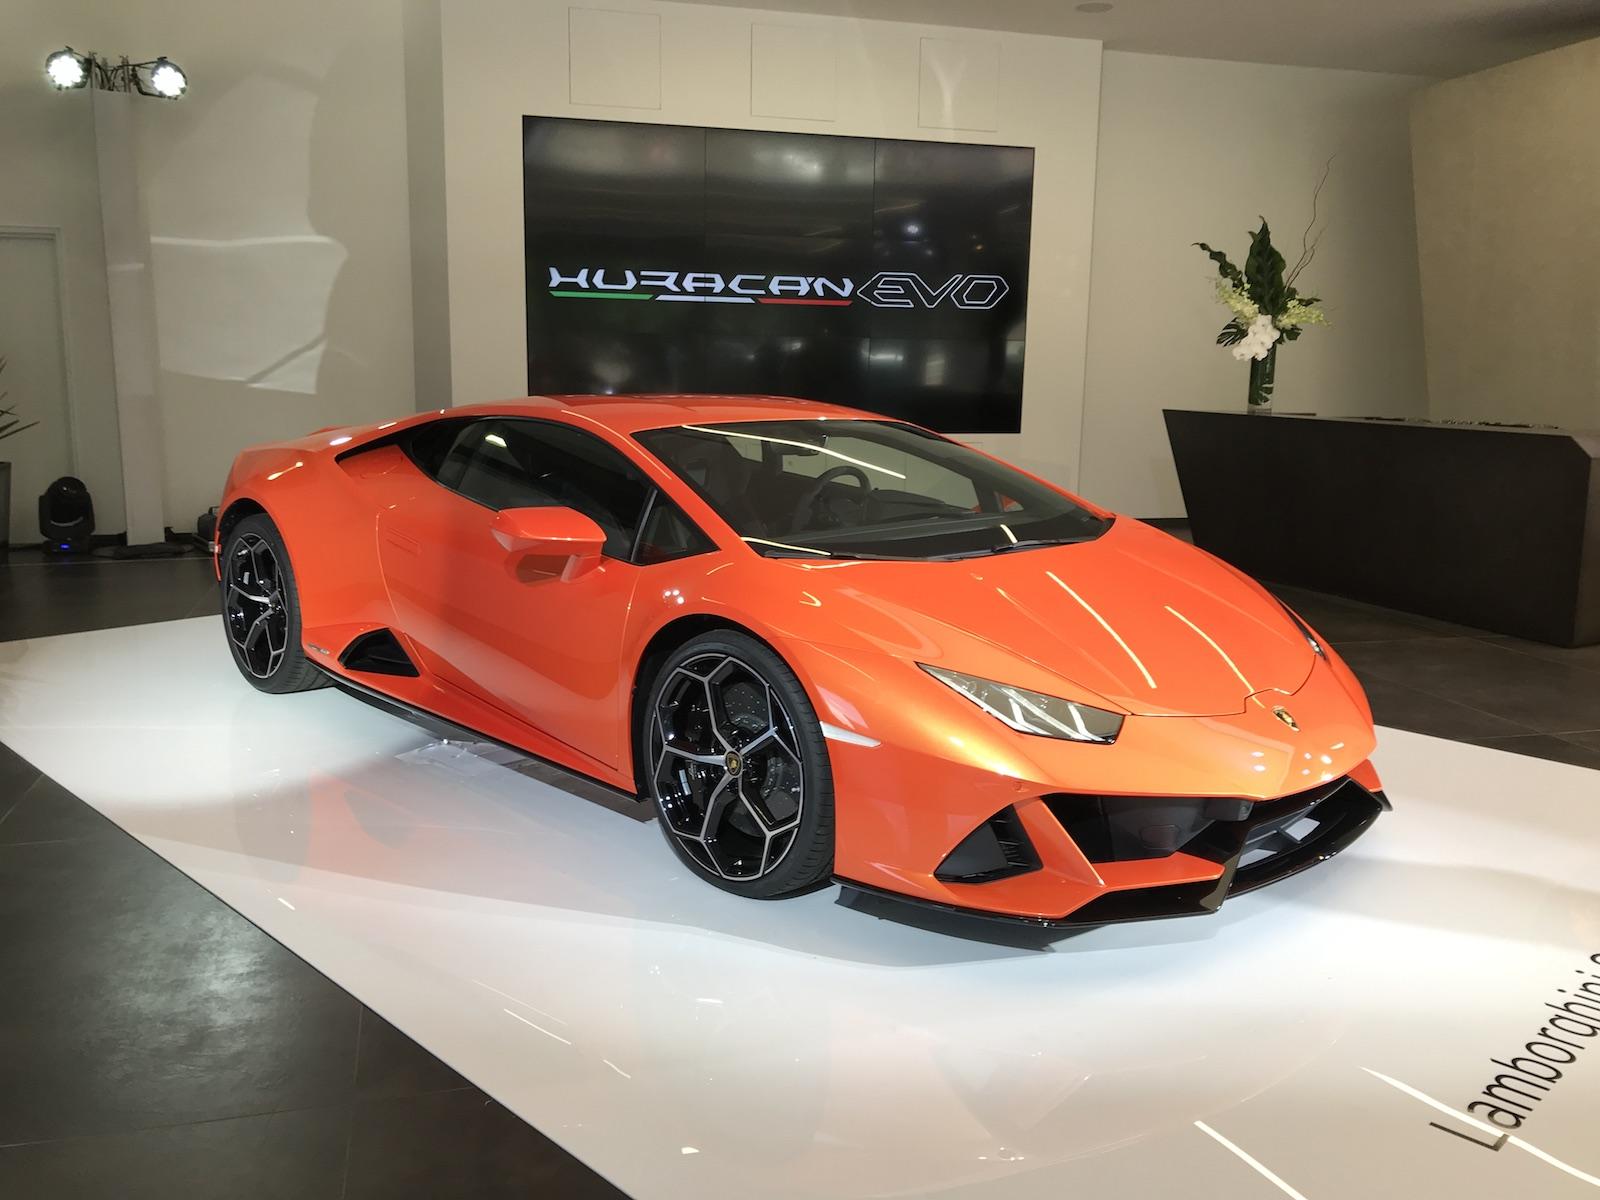 Lamborghini Huracan Evo Debuts In Australia Prices Confirmed